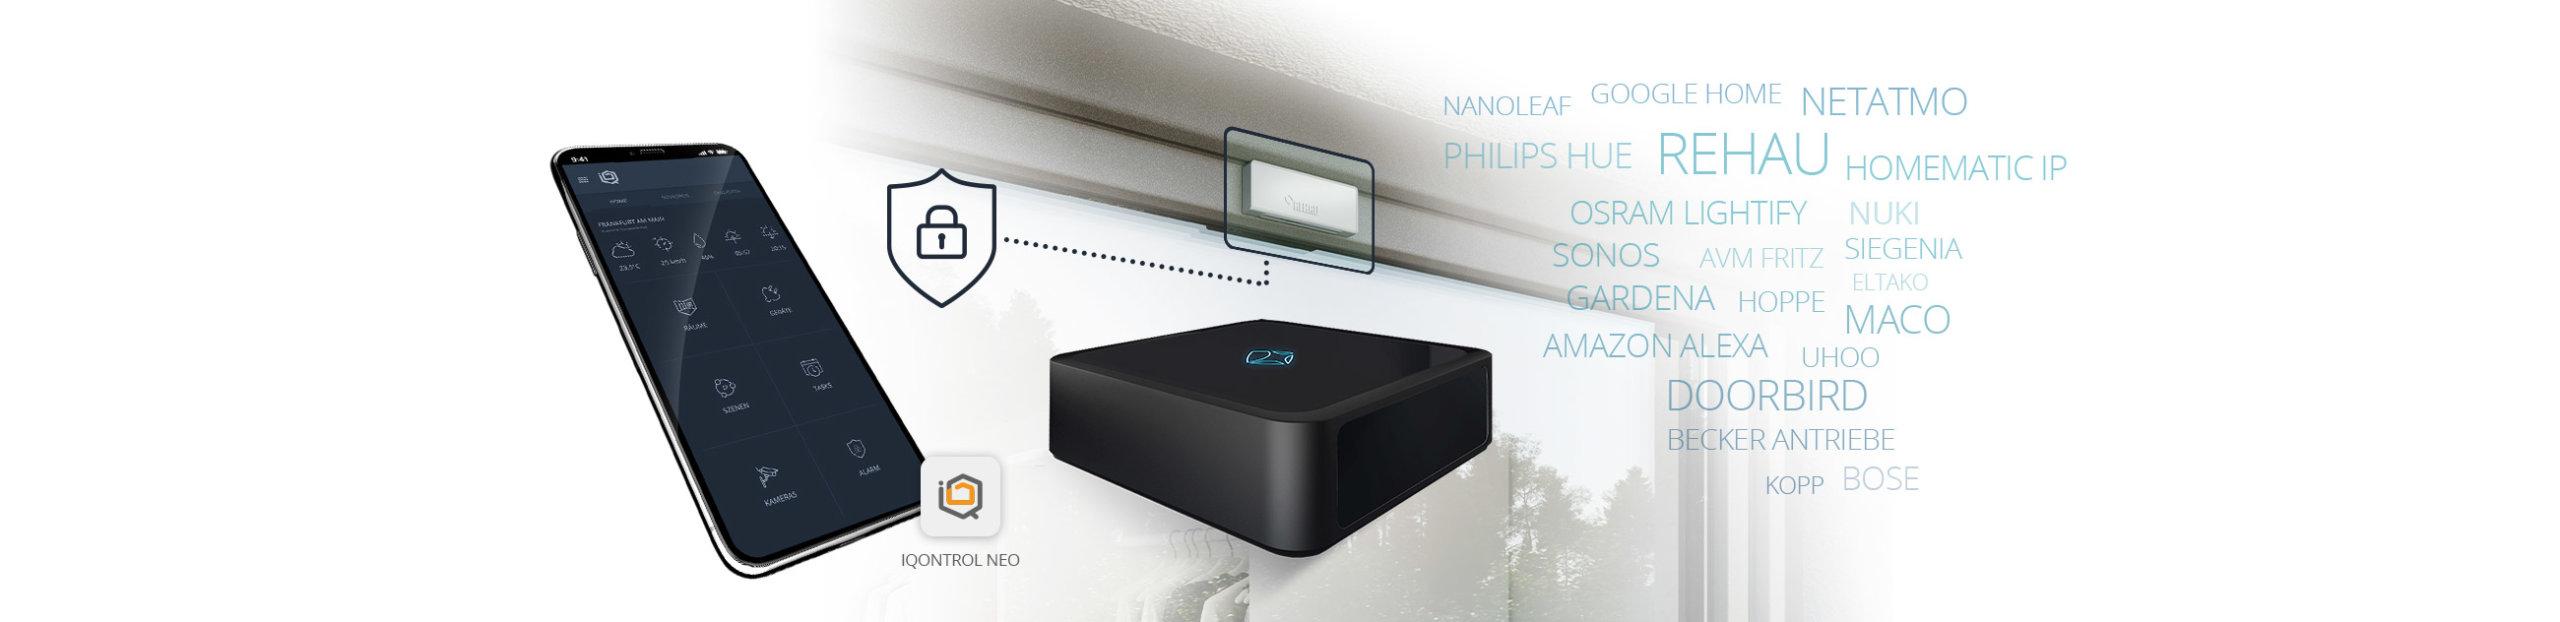 Rehau Smart Guard - Works with mediola mit Iqontrol Neo & AIO Gateway